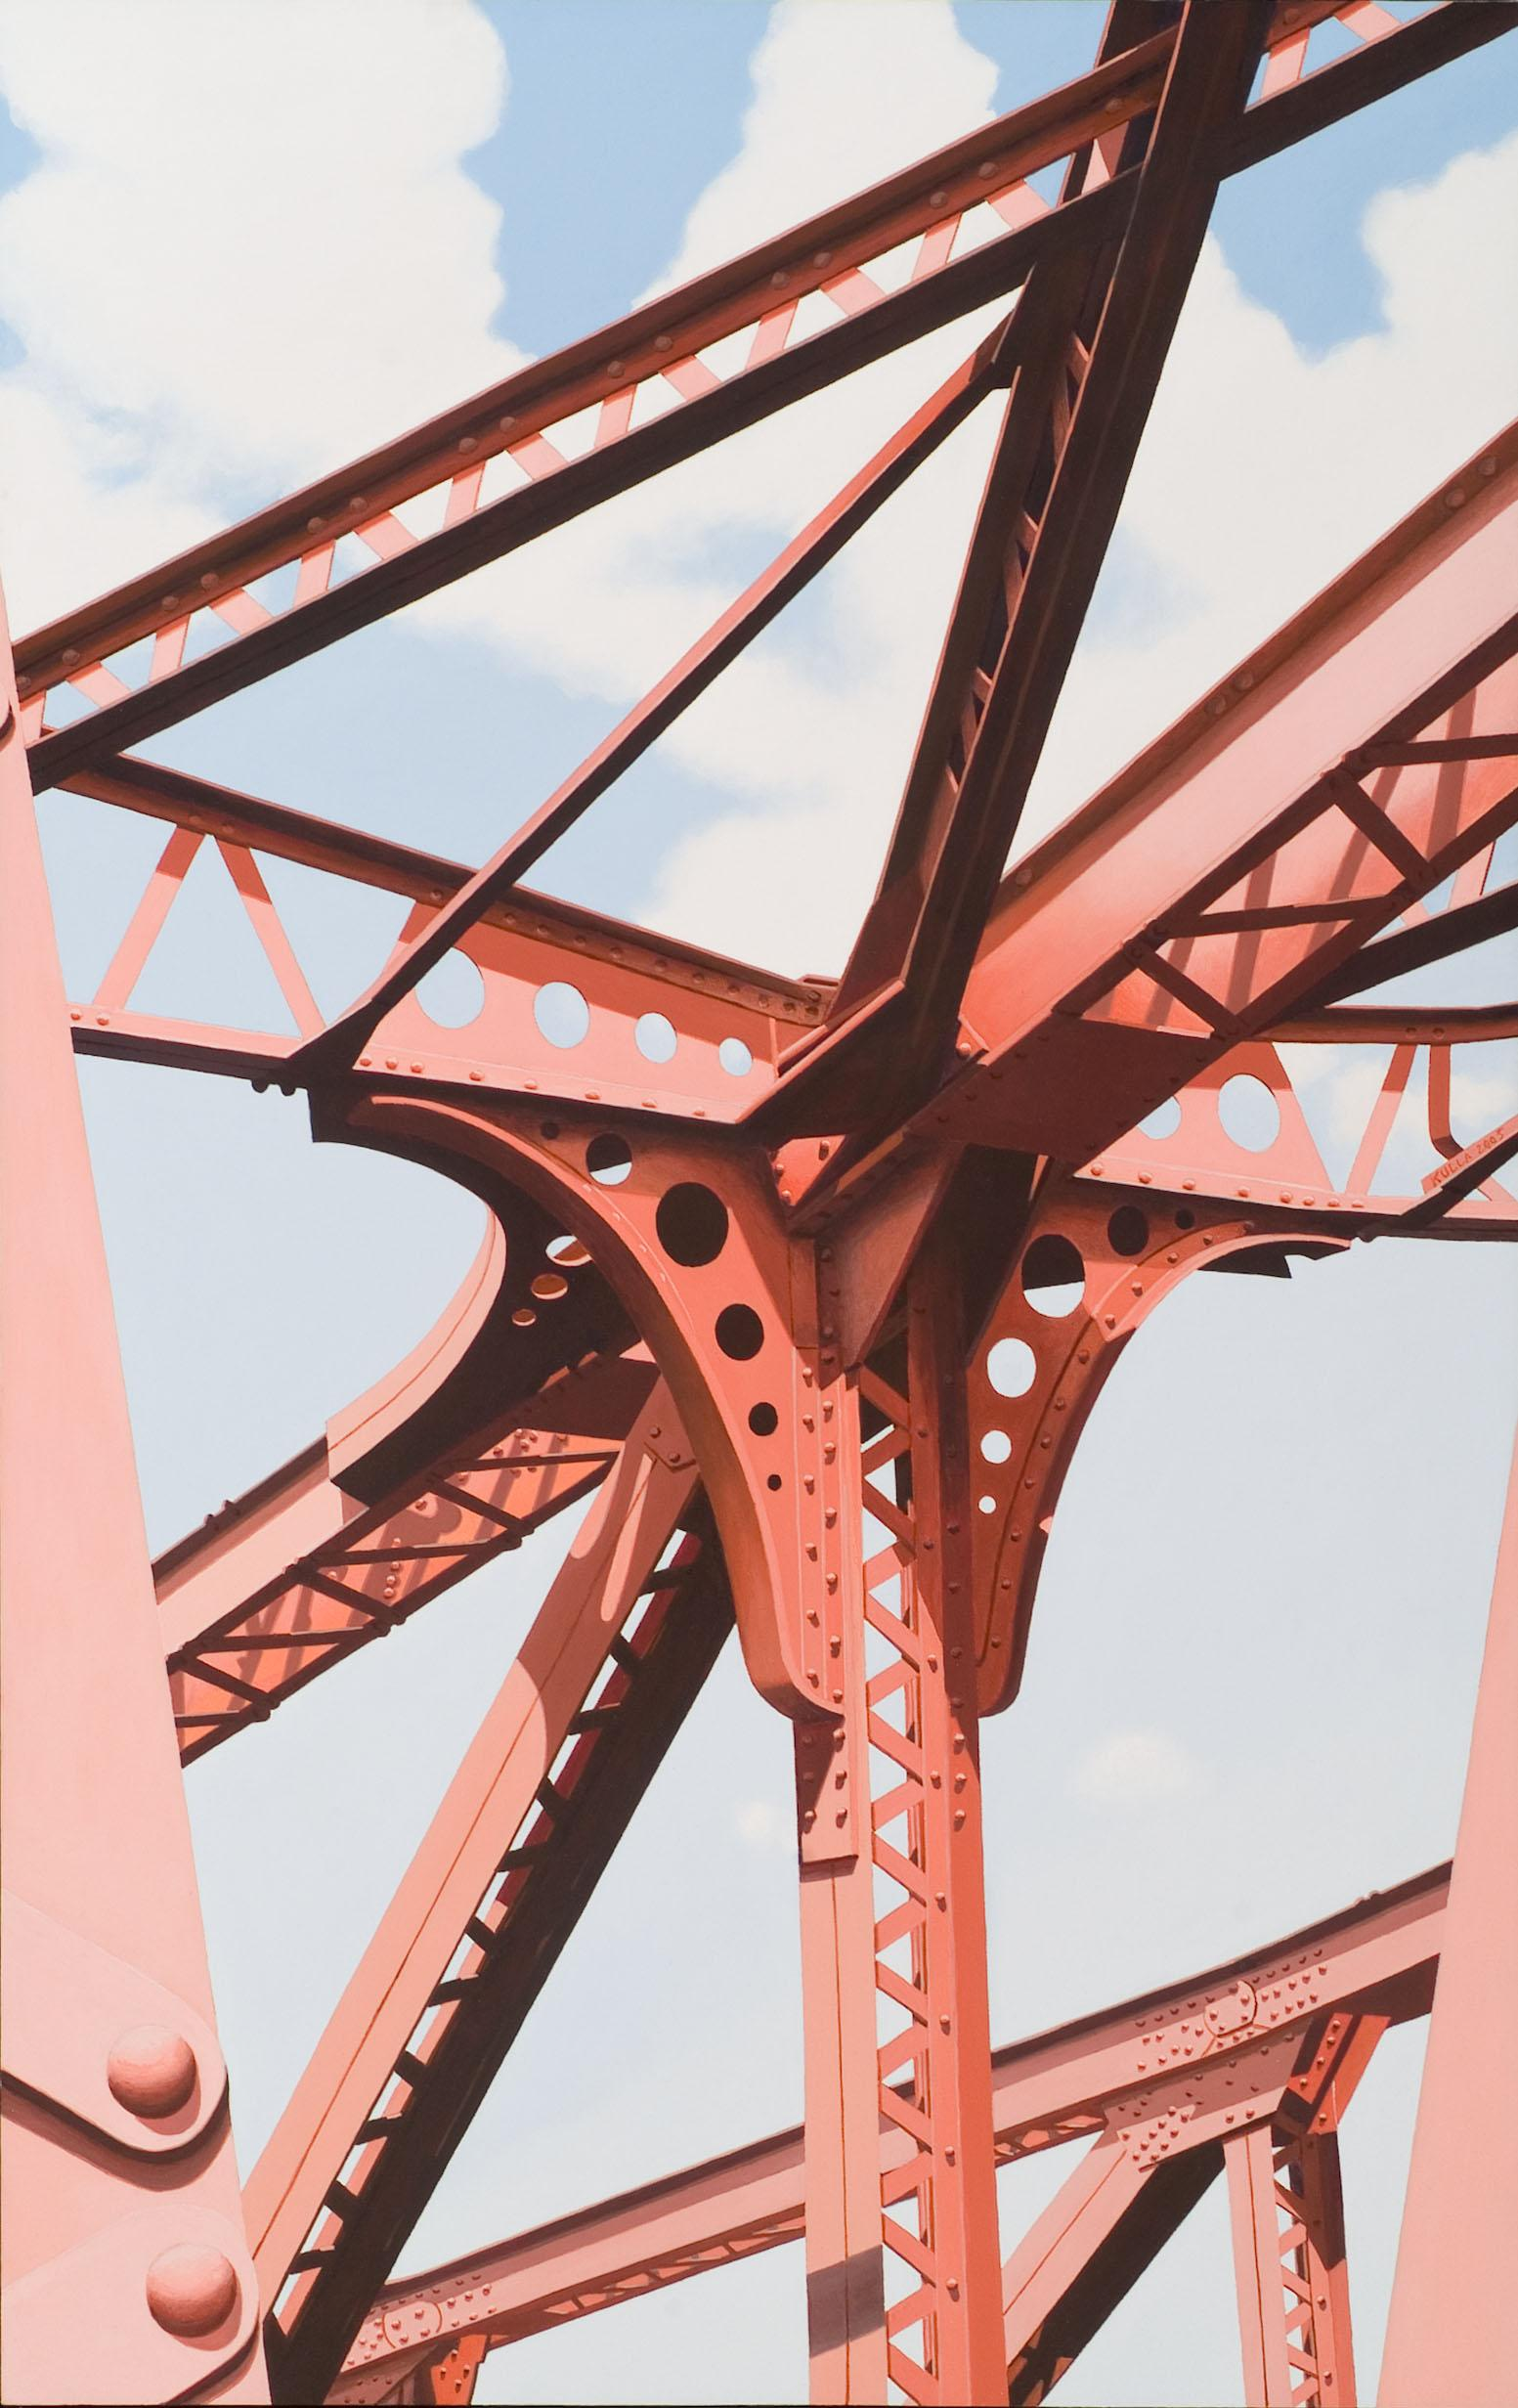 North Ave. - Red iron steel girder bridge contemporary photorealist painting